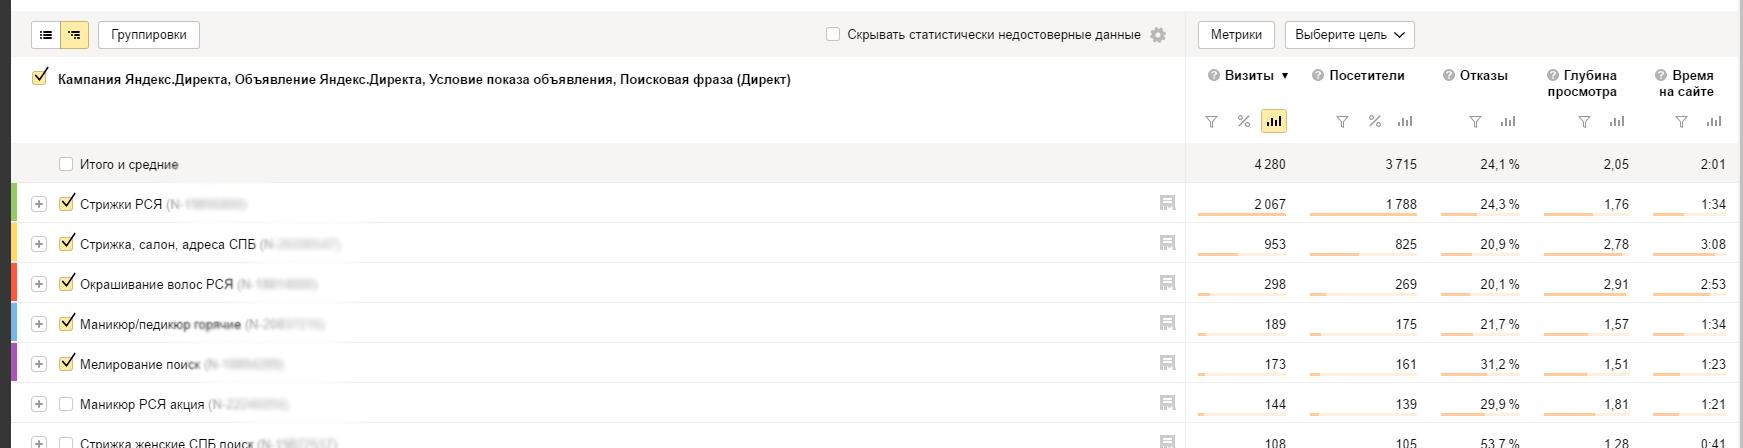 Отчет о кампании в Директе в Яндекс Метрике